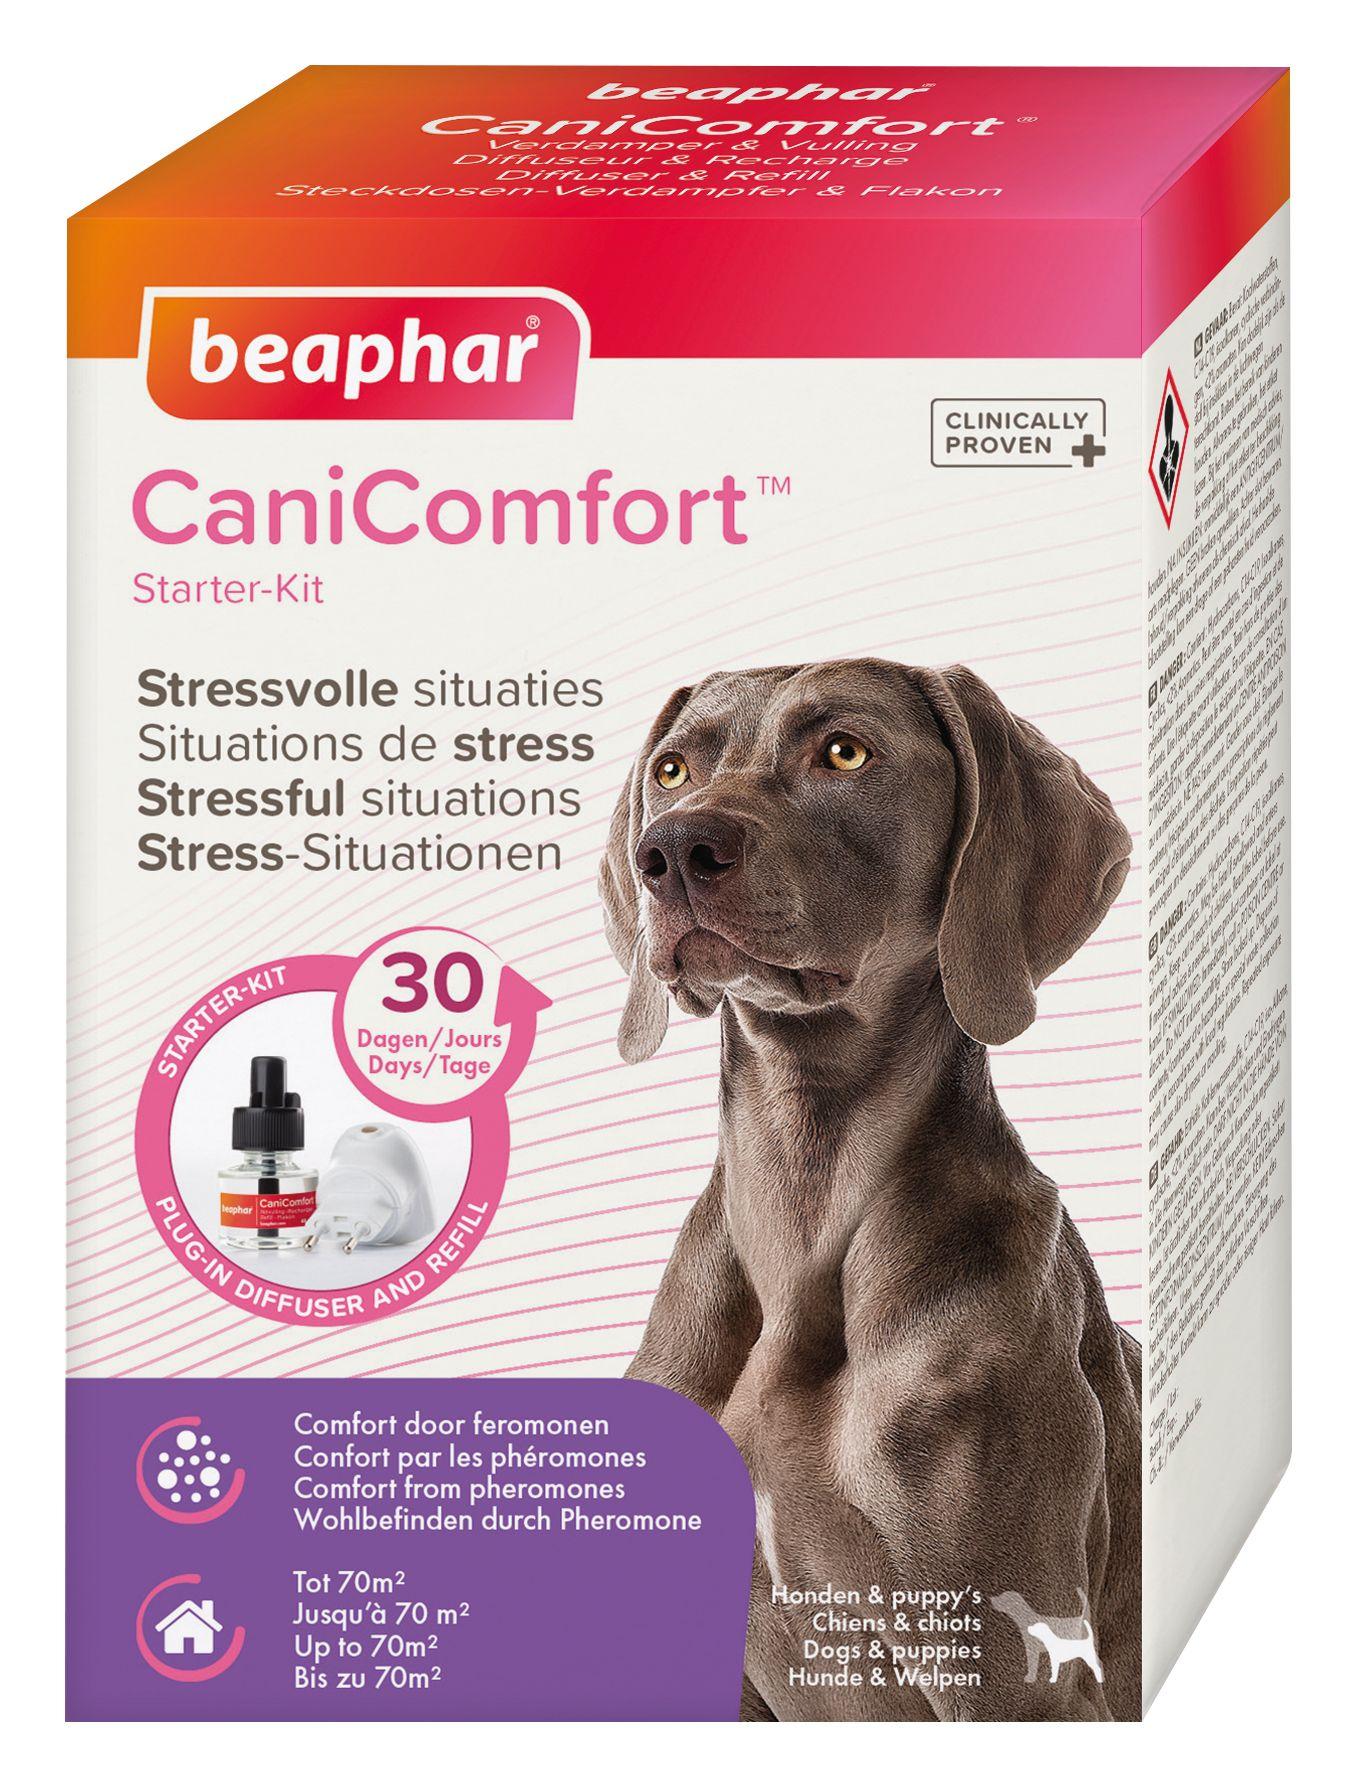 Beaphar CaniComfort Diffuser Sett Hund